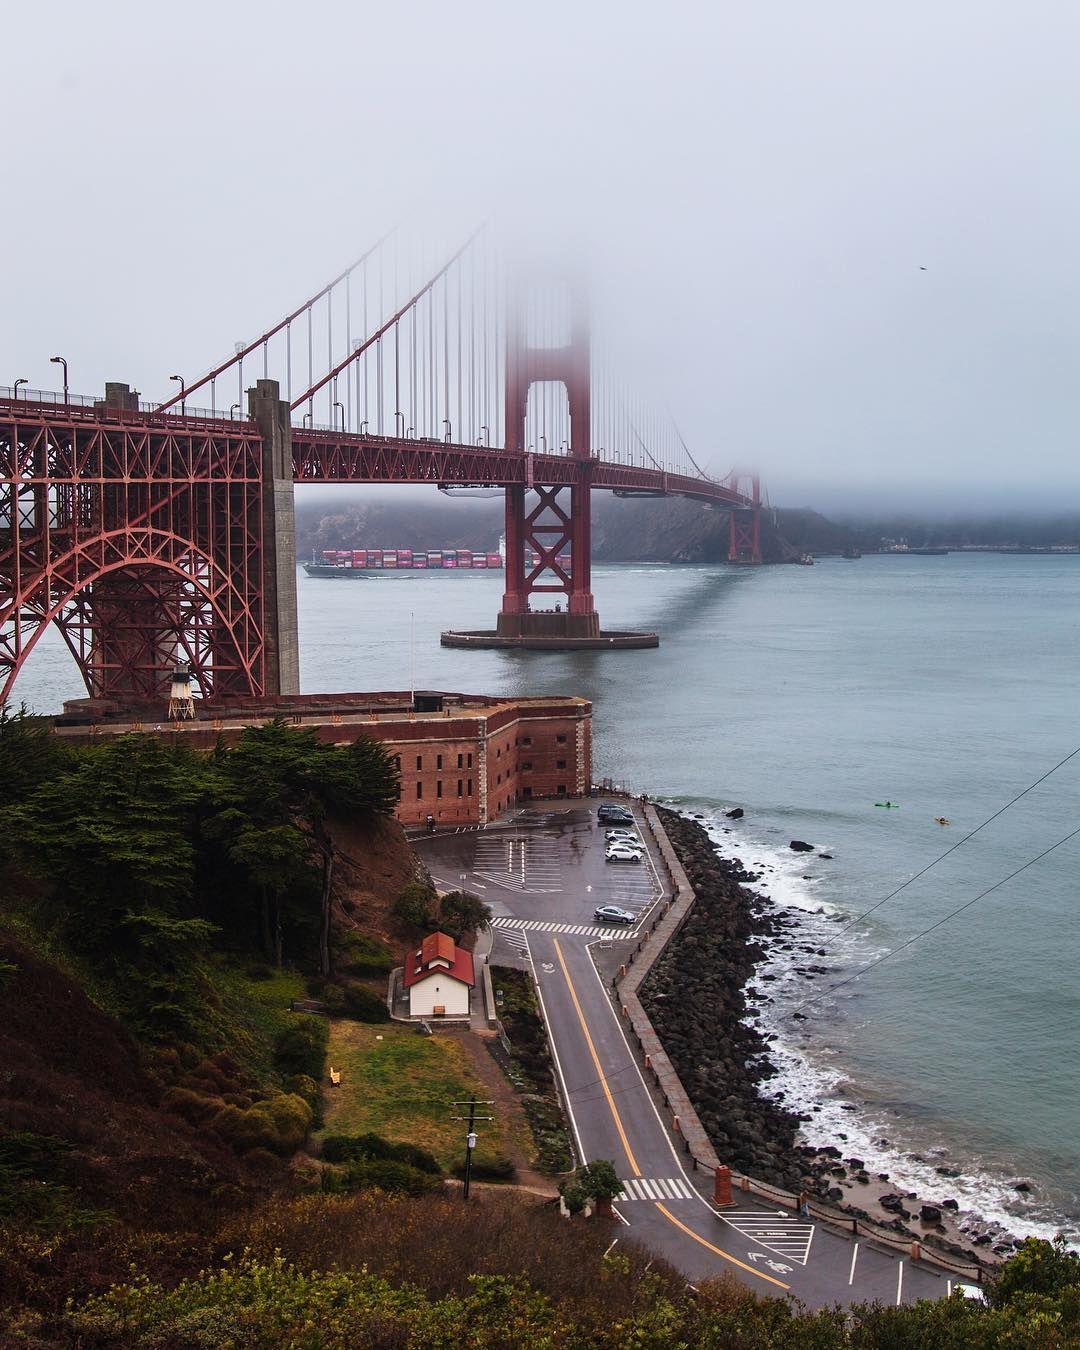 The Beautiful Golden Gate Bridge In The Rain Under A Blanket Of